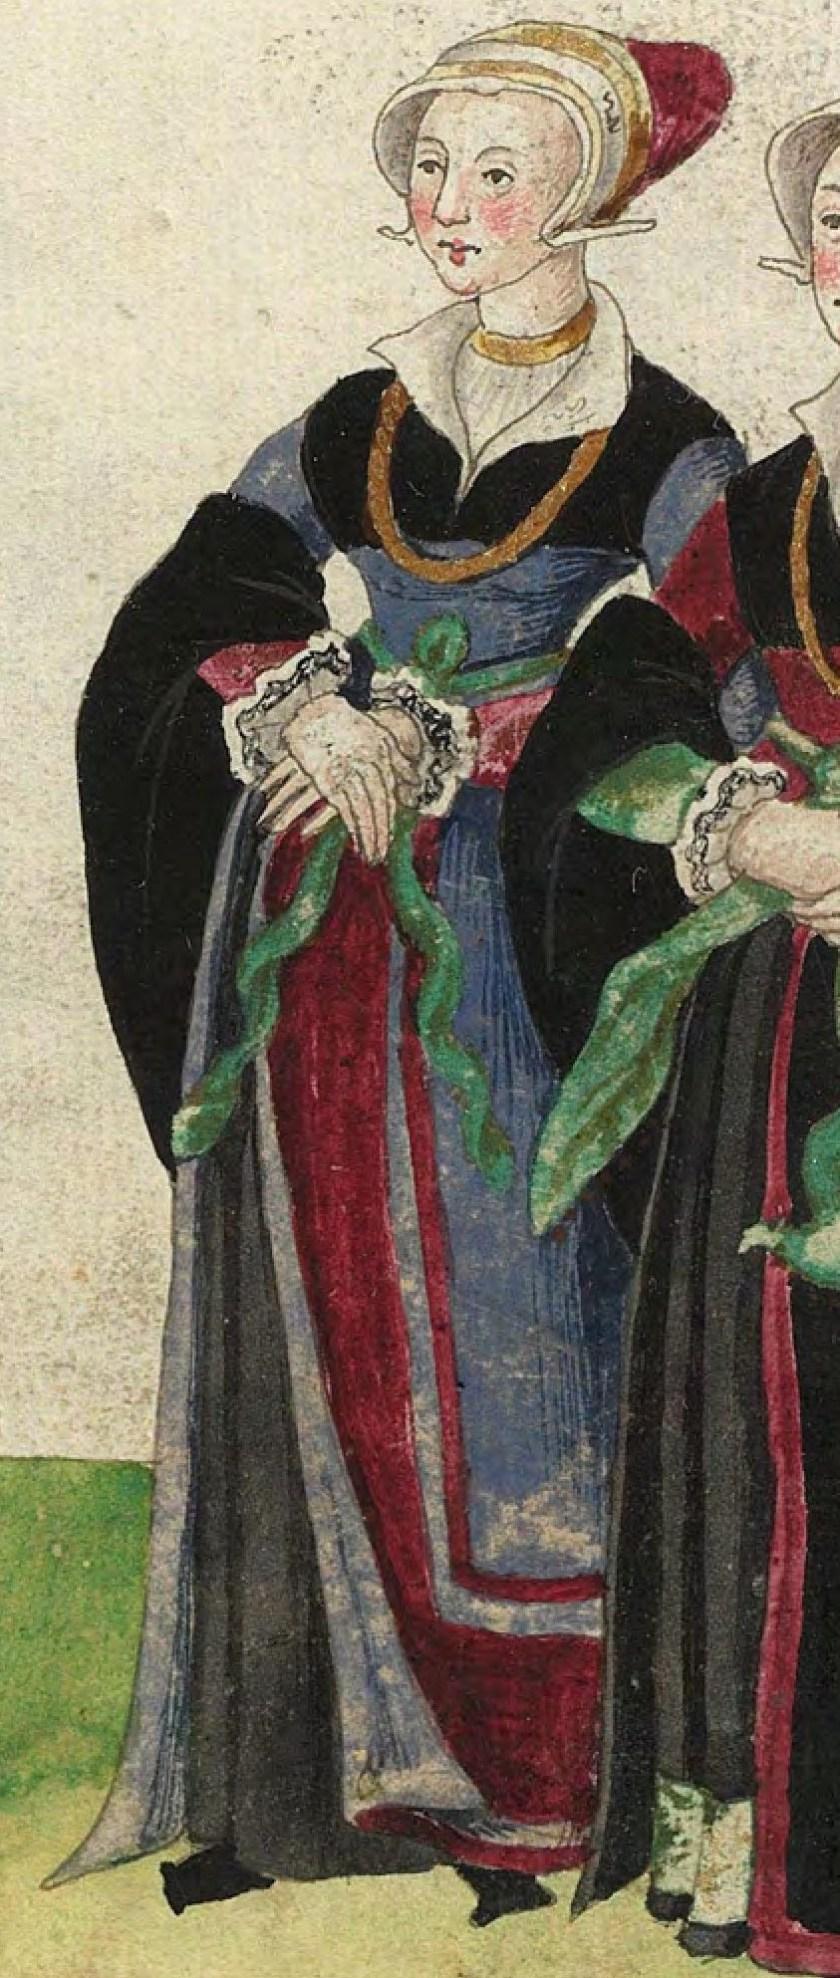 1540s Gelders nobility. Fig. 2, plate 33r, Codice de trajes, Christoph Weiditz. BNE: bdh0000052132